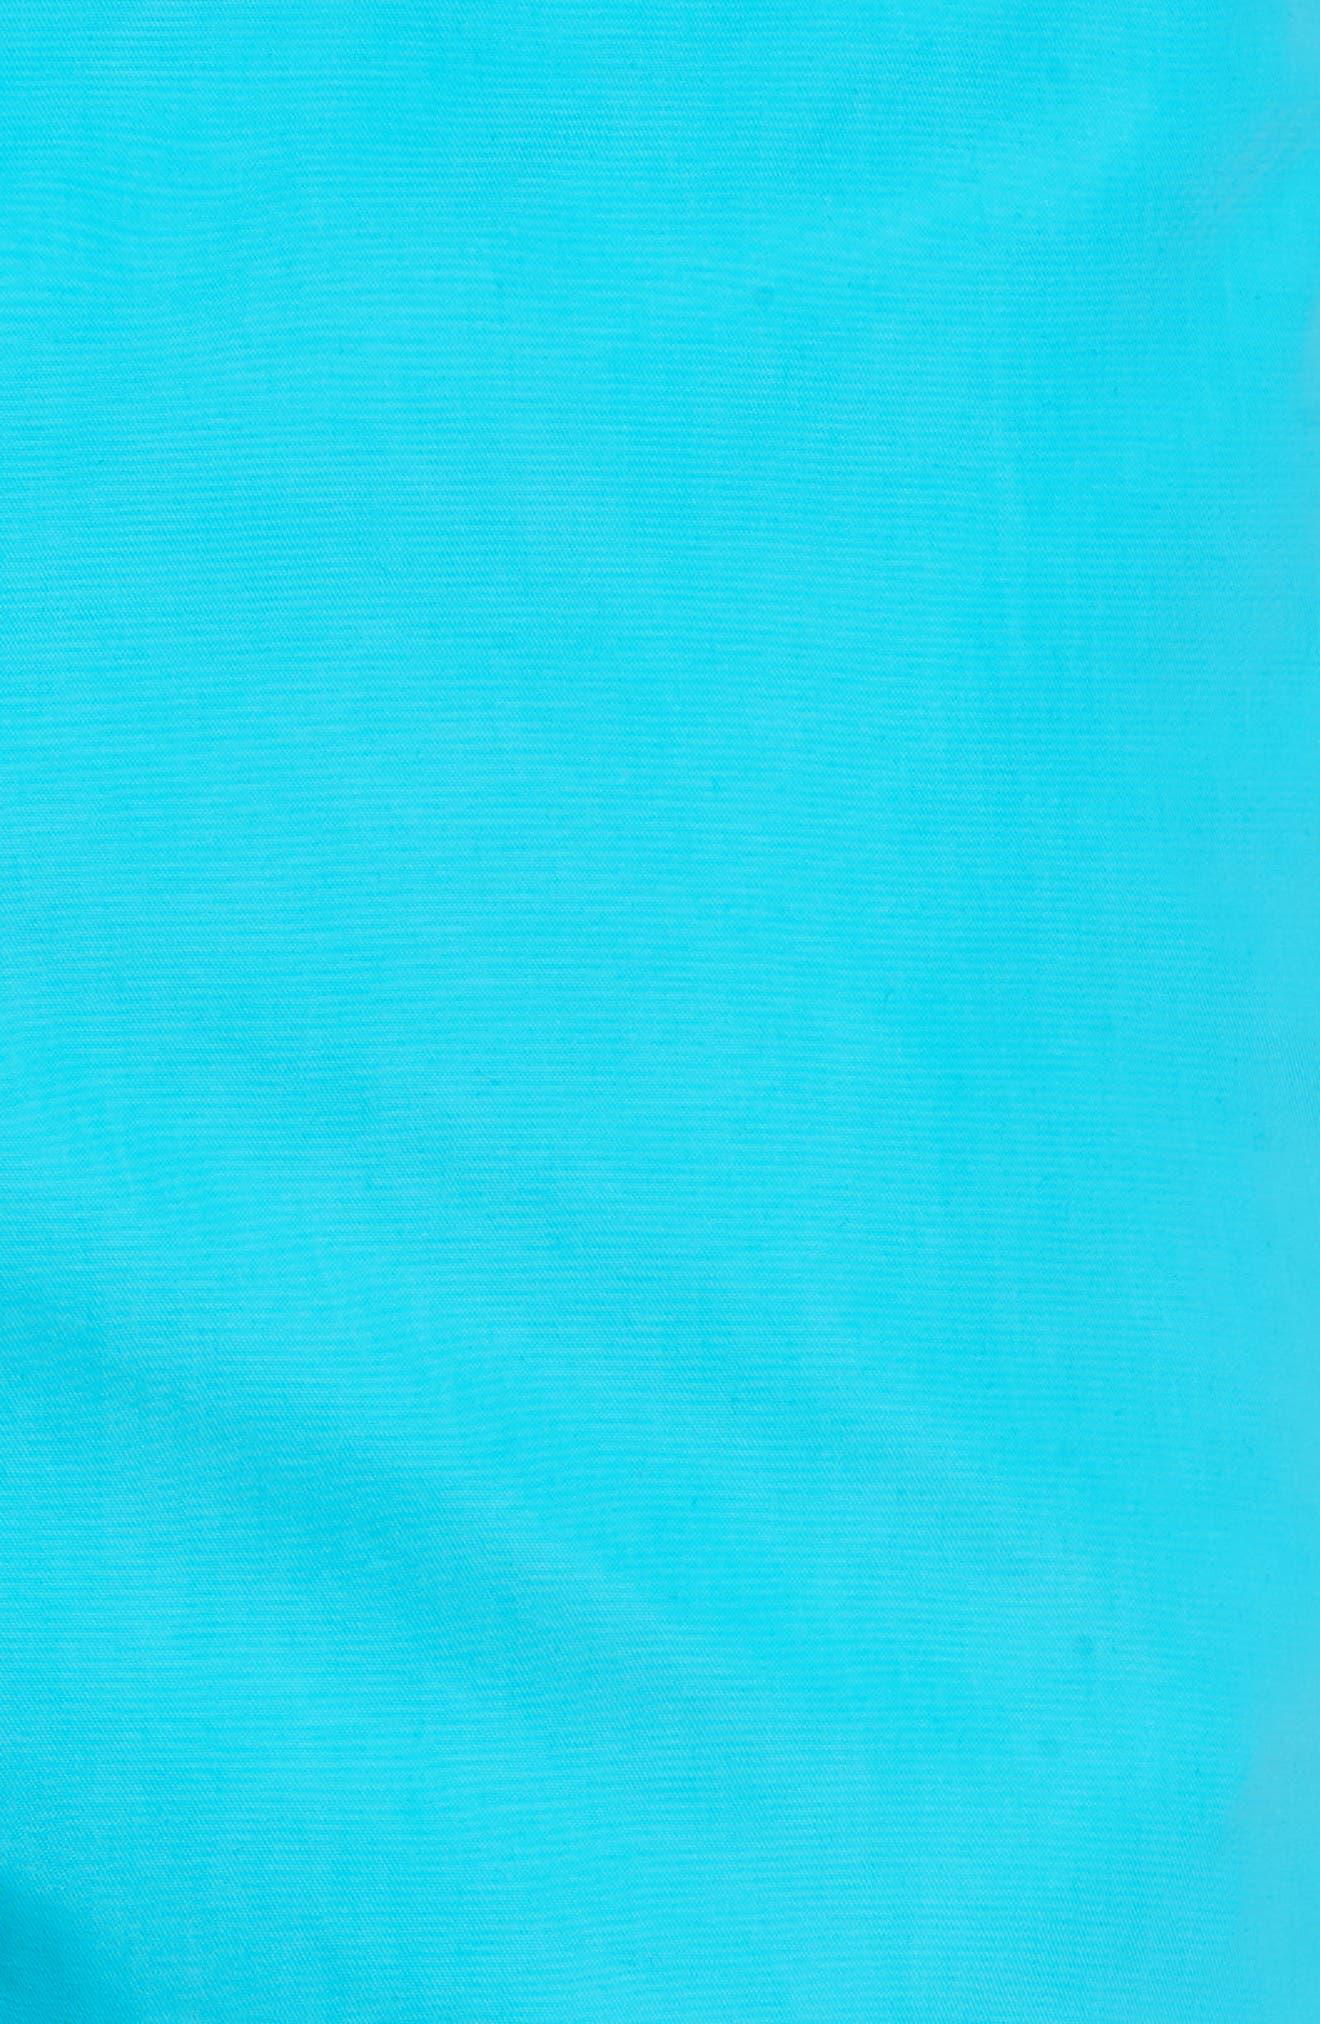 Moorea Water Reactive Swim Trunks,                             Alternate thumbnail 5, color,                             Azure